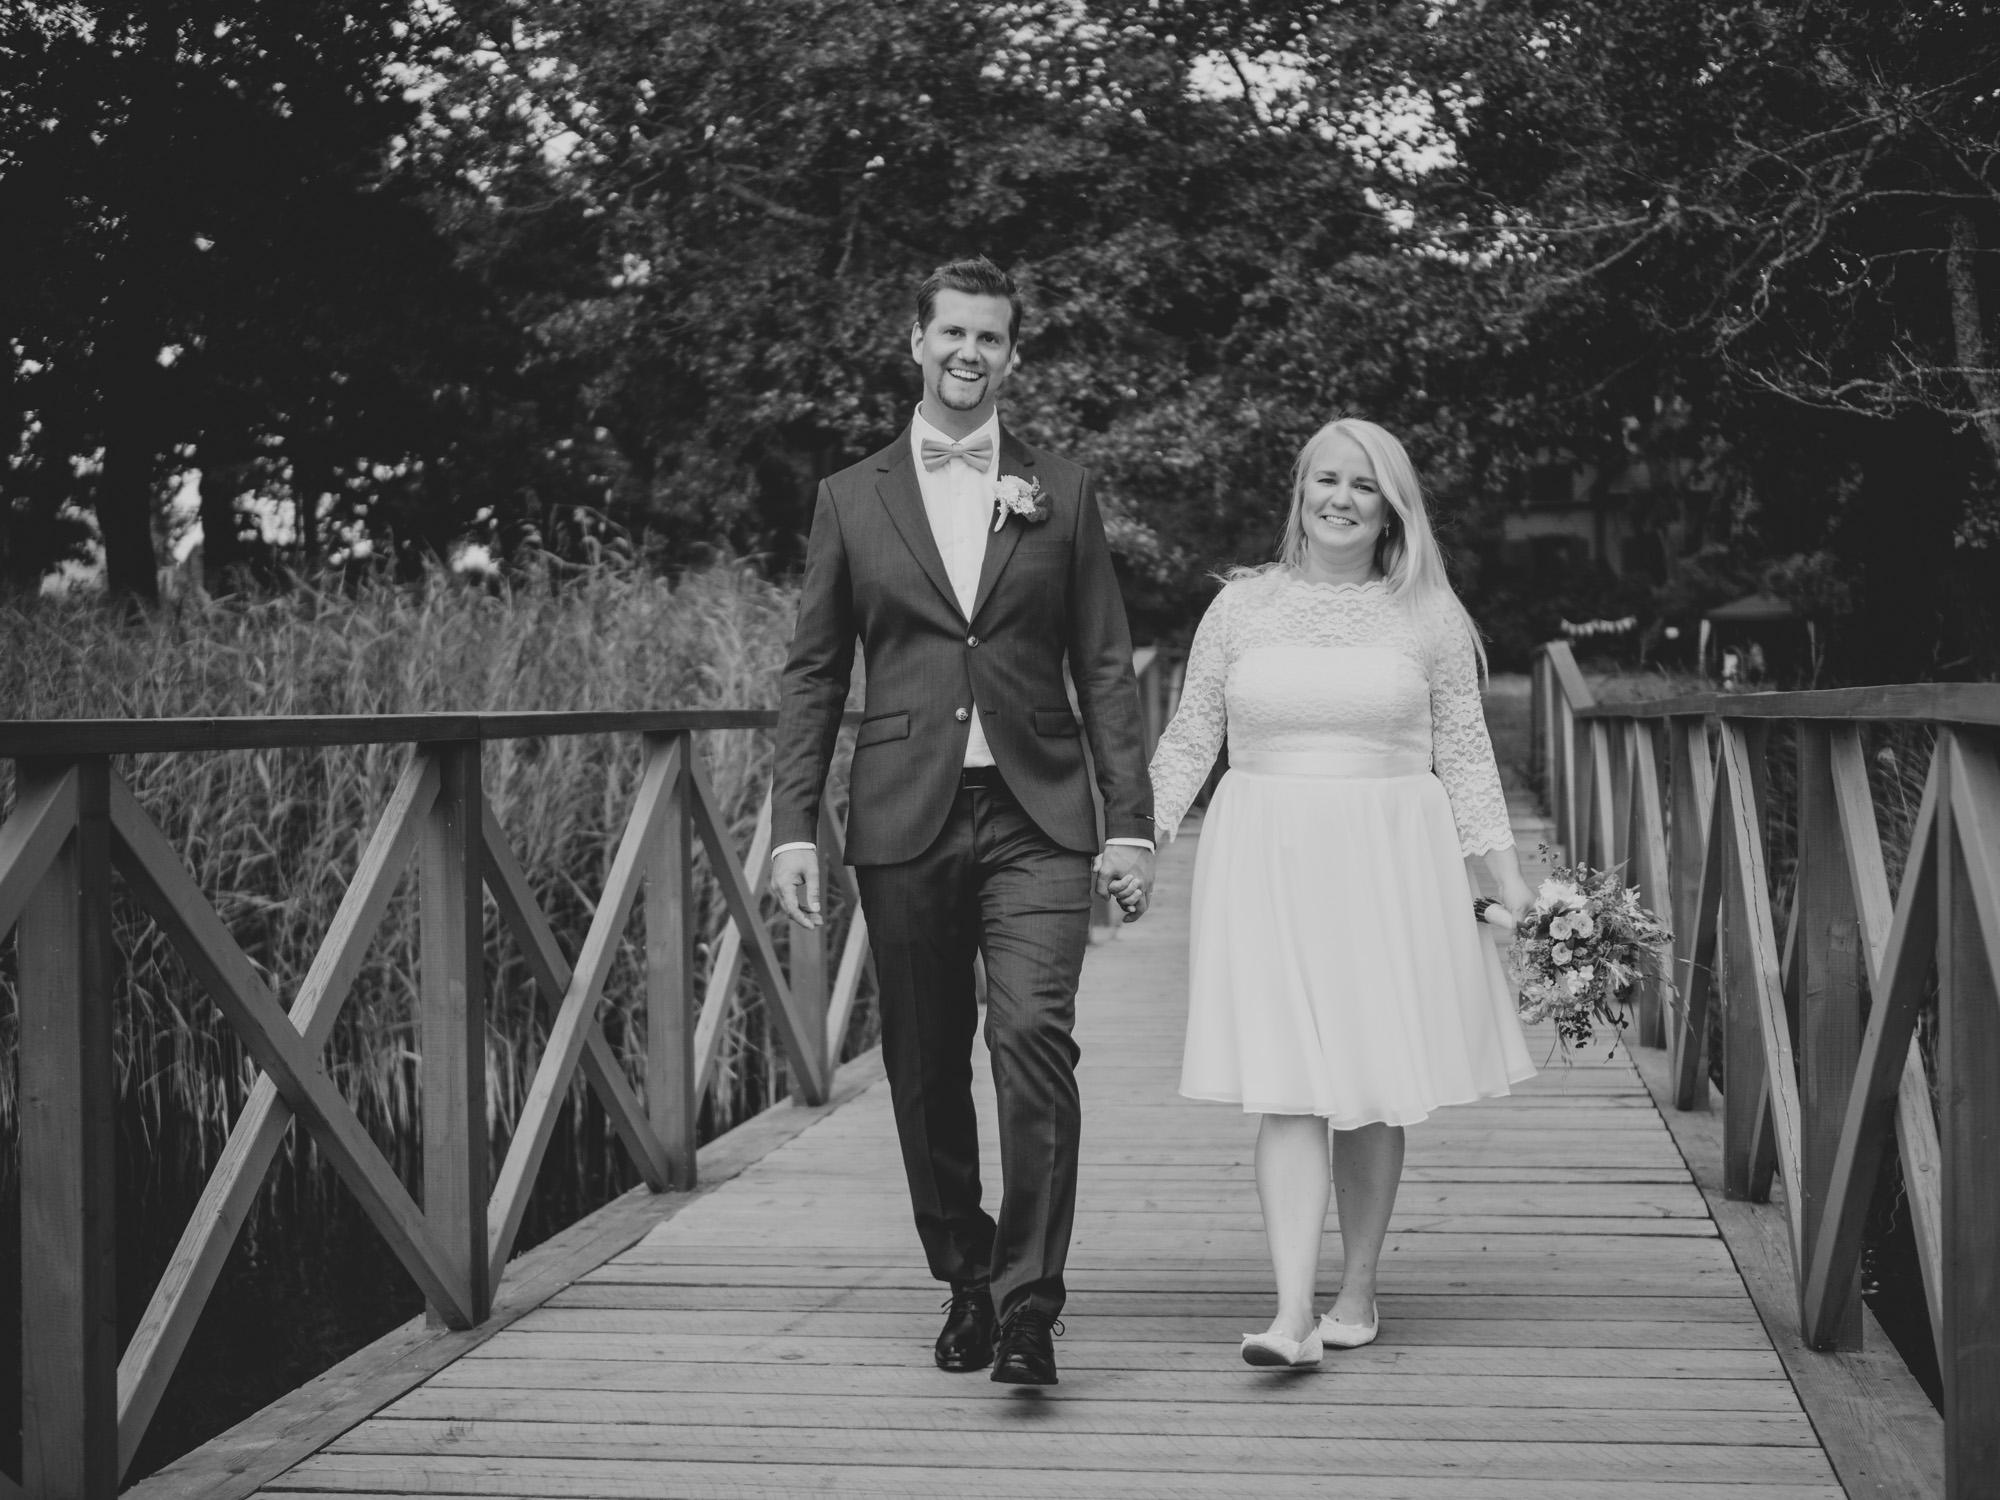 Hochzeit-Memory-factory-20180721-0020.jpg